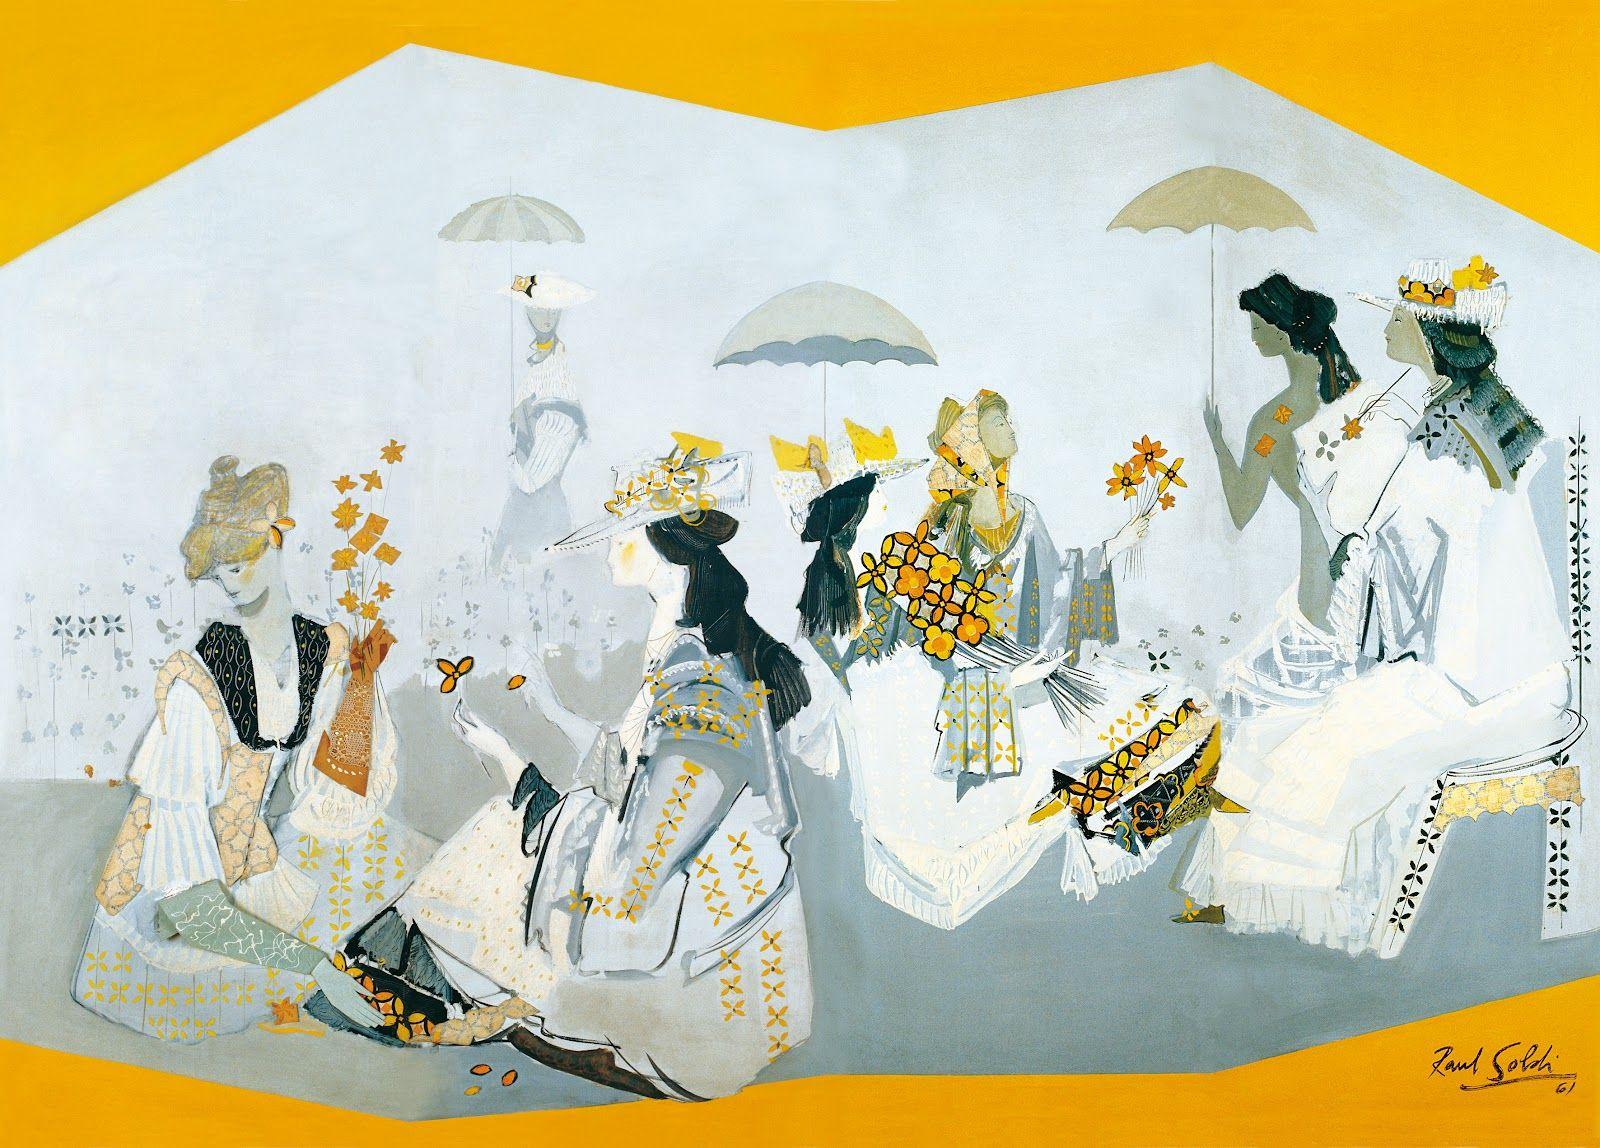 Ra L Soldi Primavera Pintura Argentina Pinterest Primavera  # Muebles Gepetto Mora